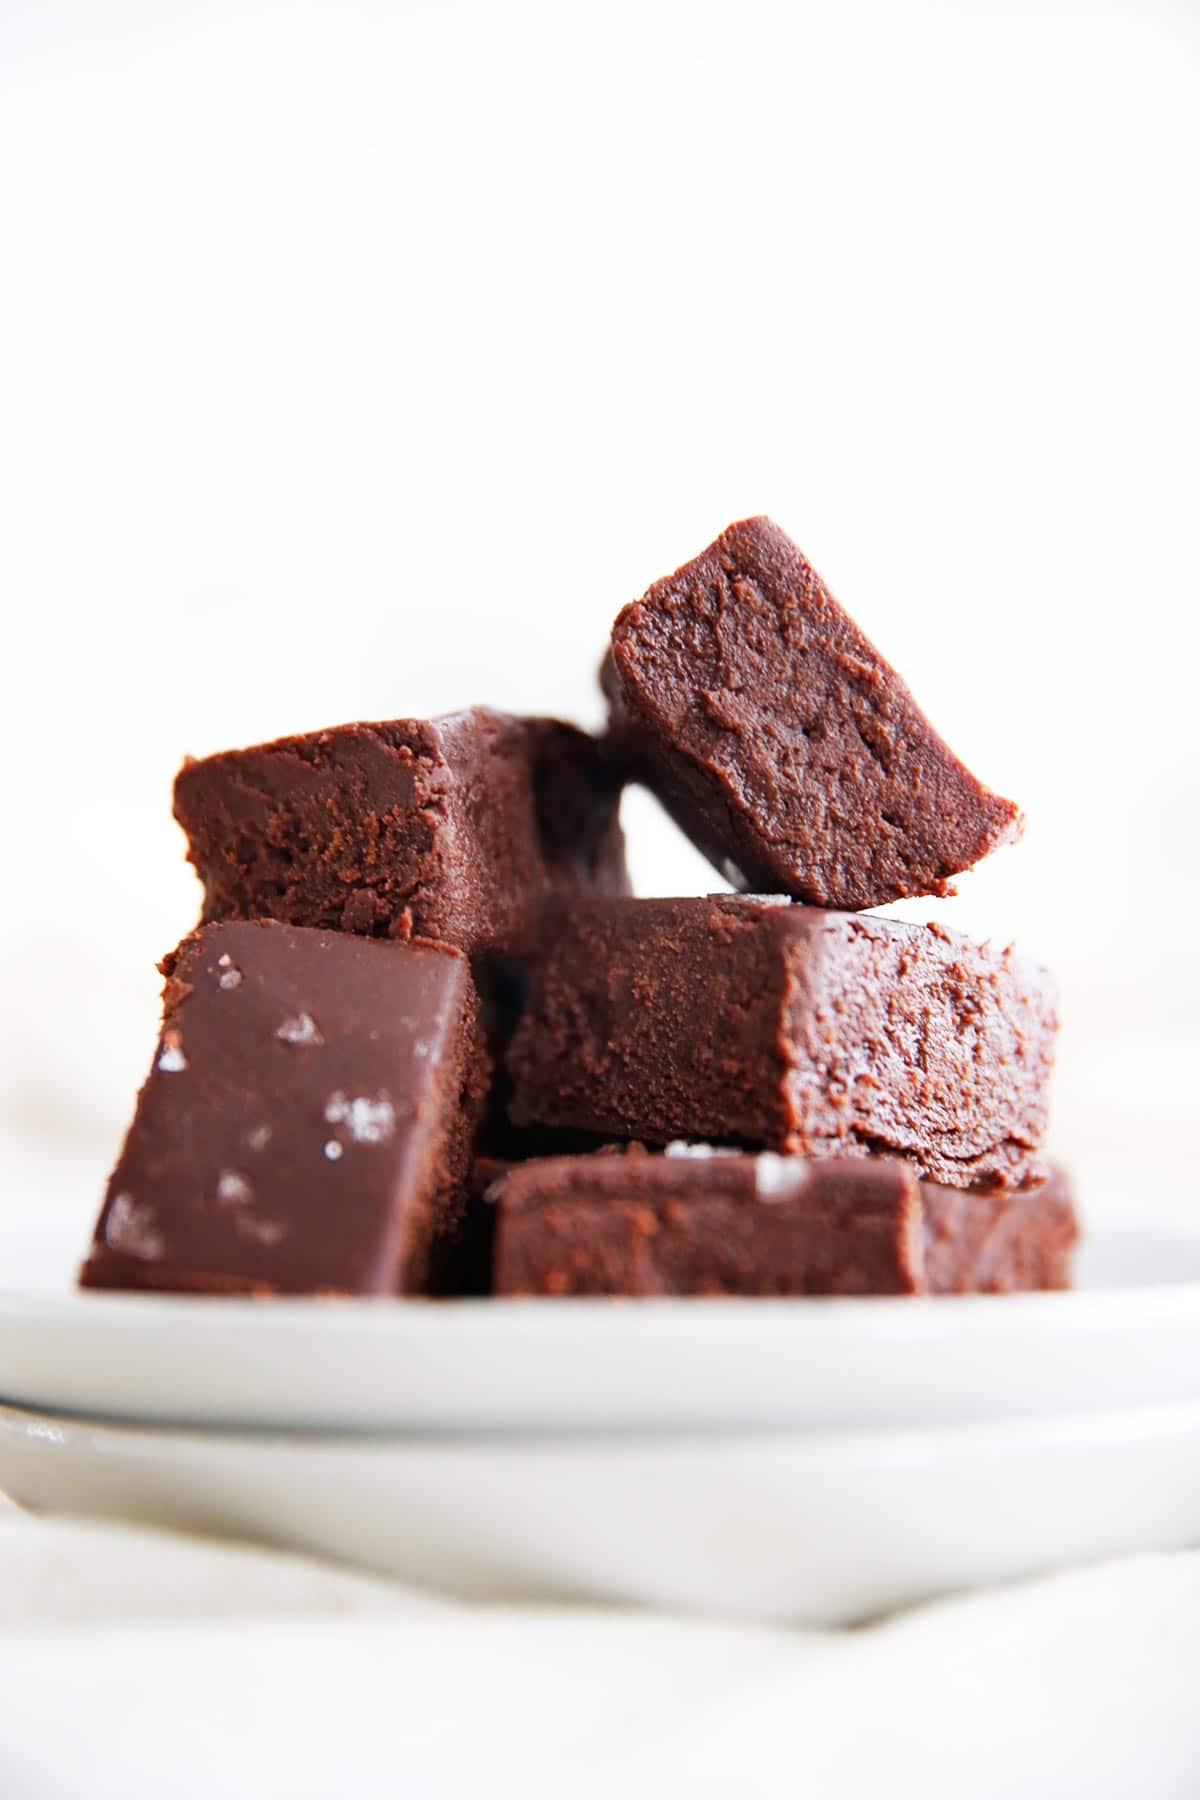 5 Ingredient Healthy Chocolate Fudge Recipe